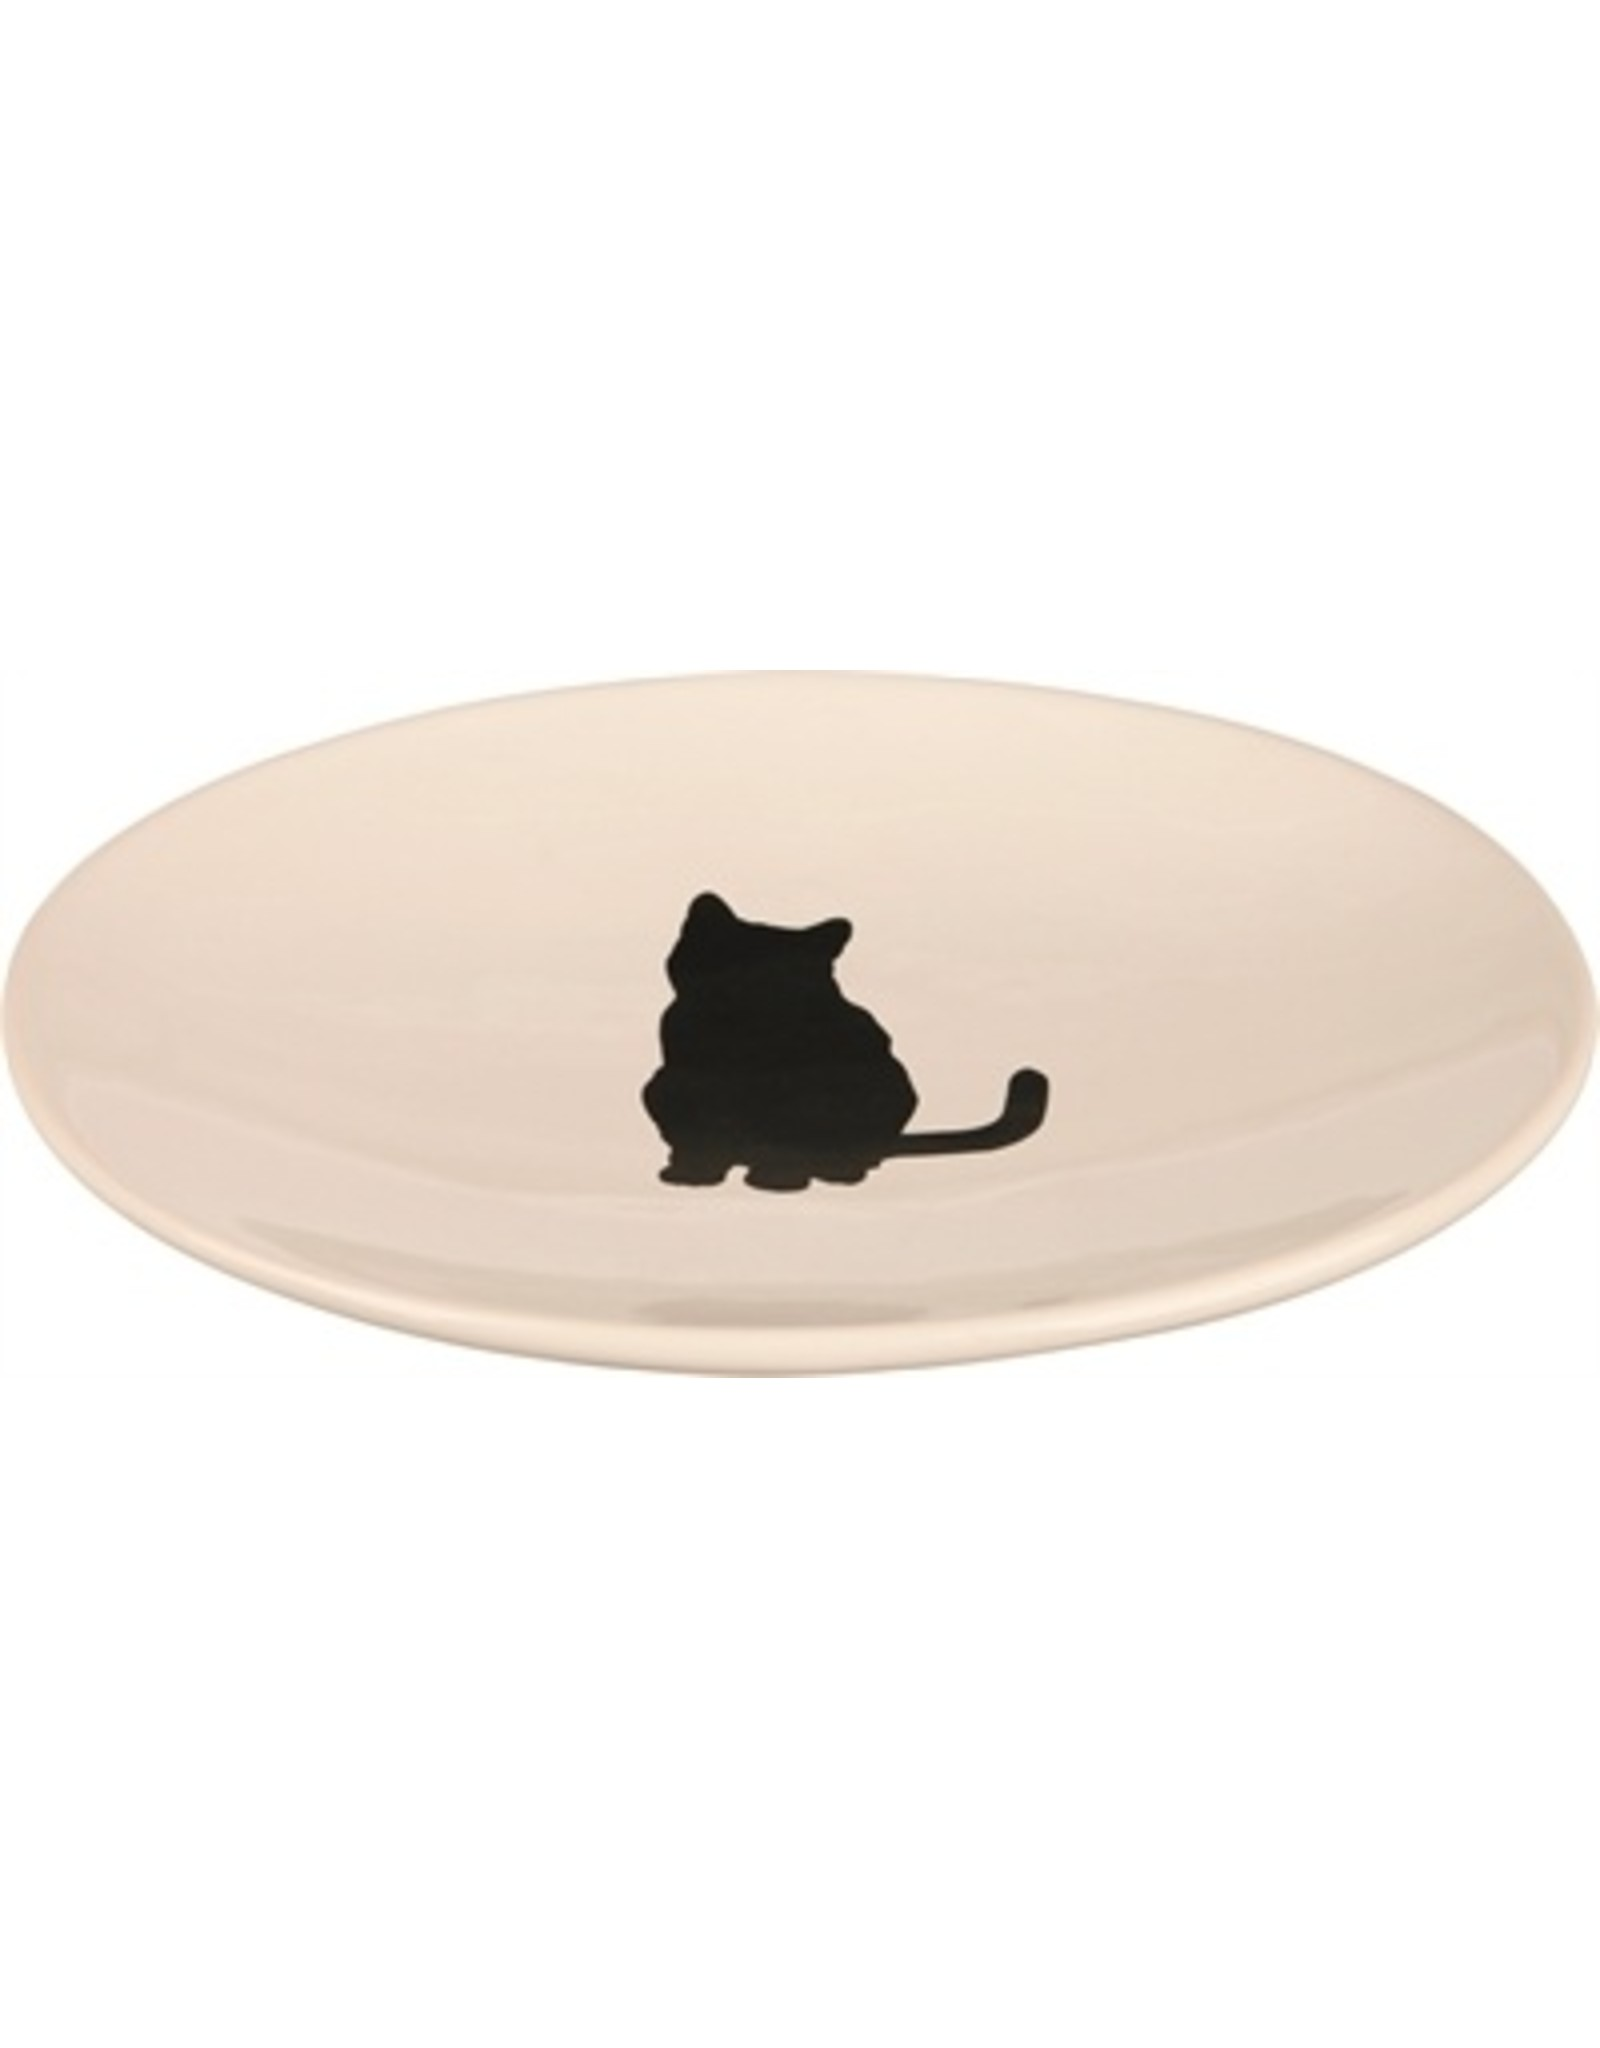 trixie Trixie voer / drink schotel wit met silhouette kat